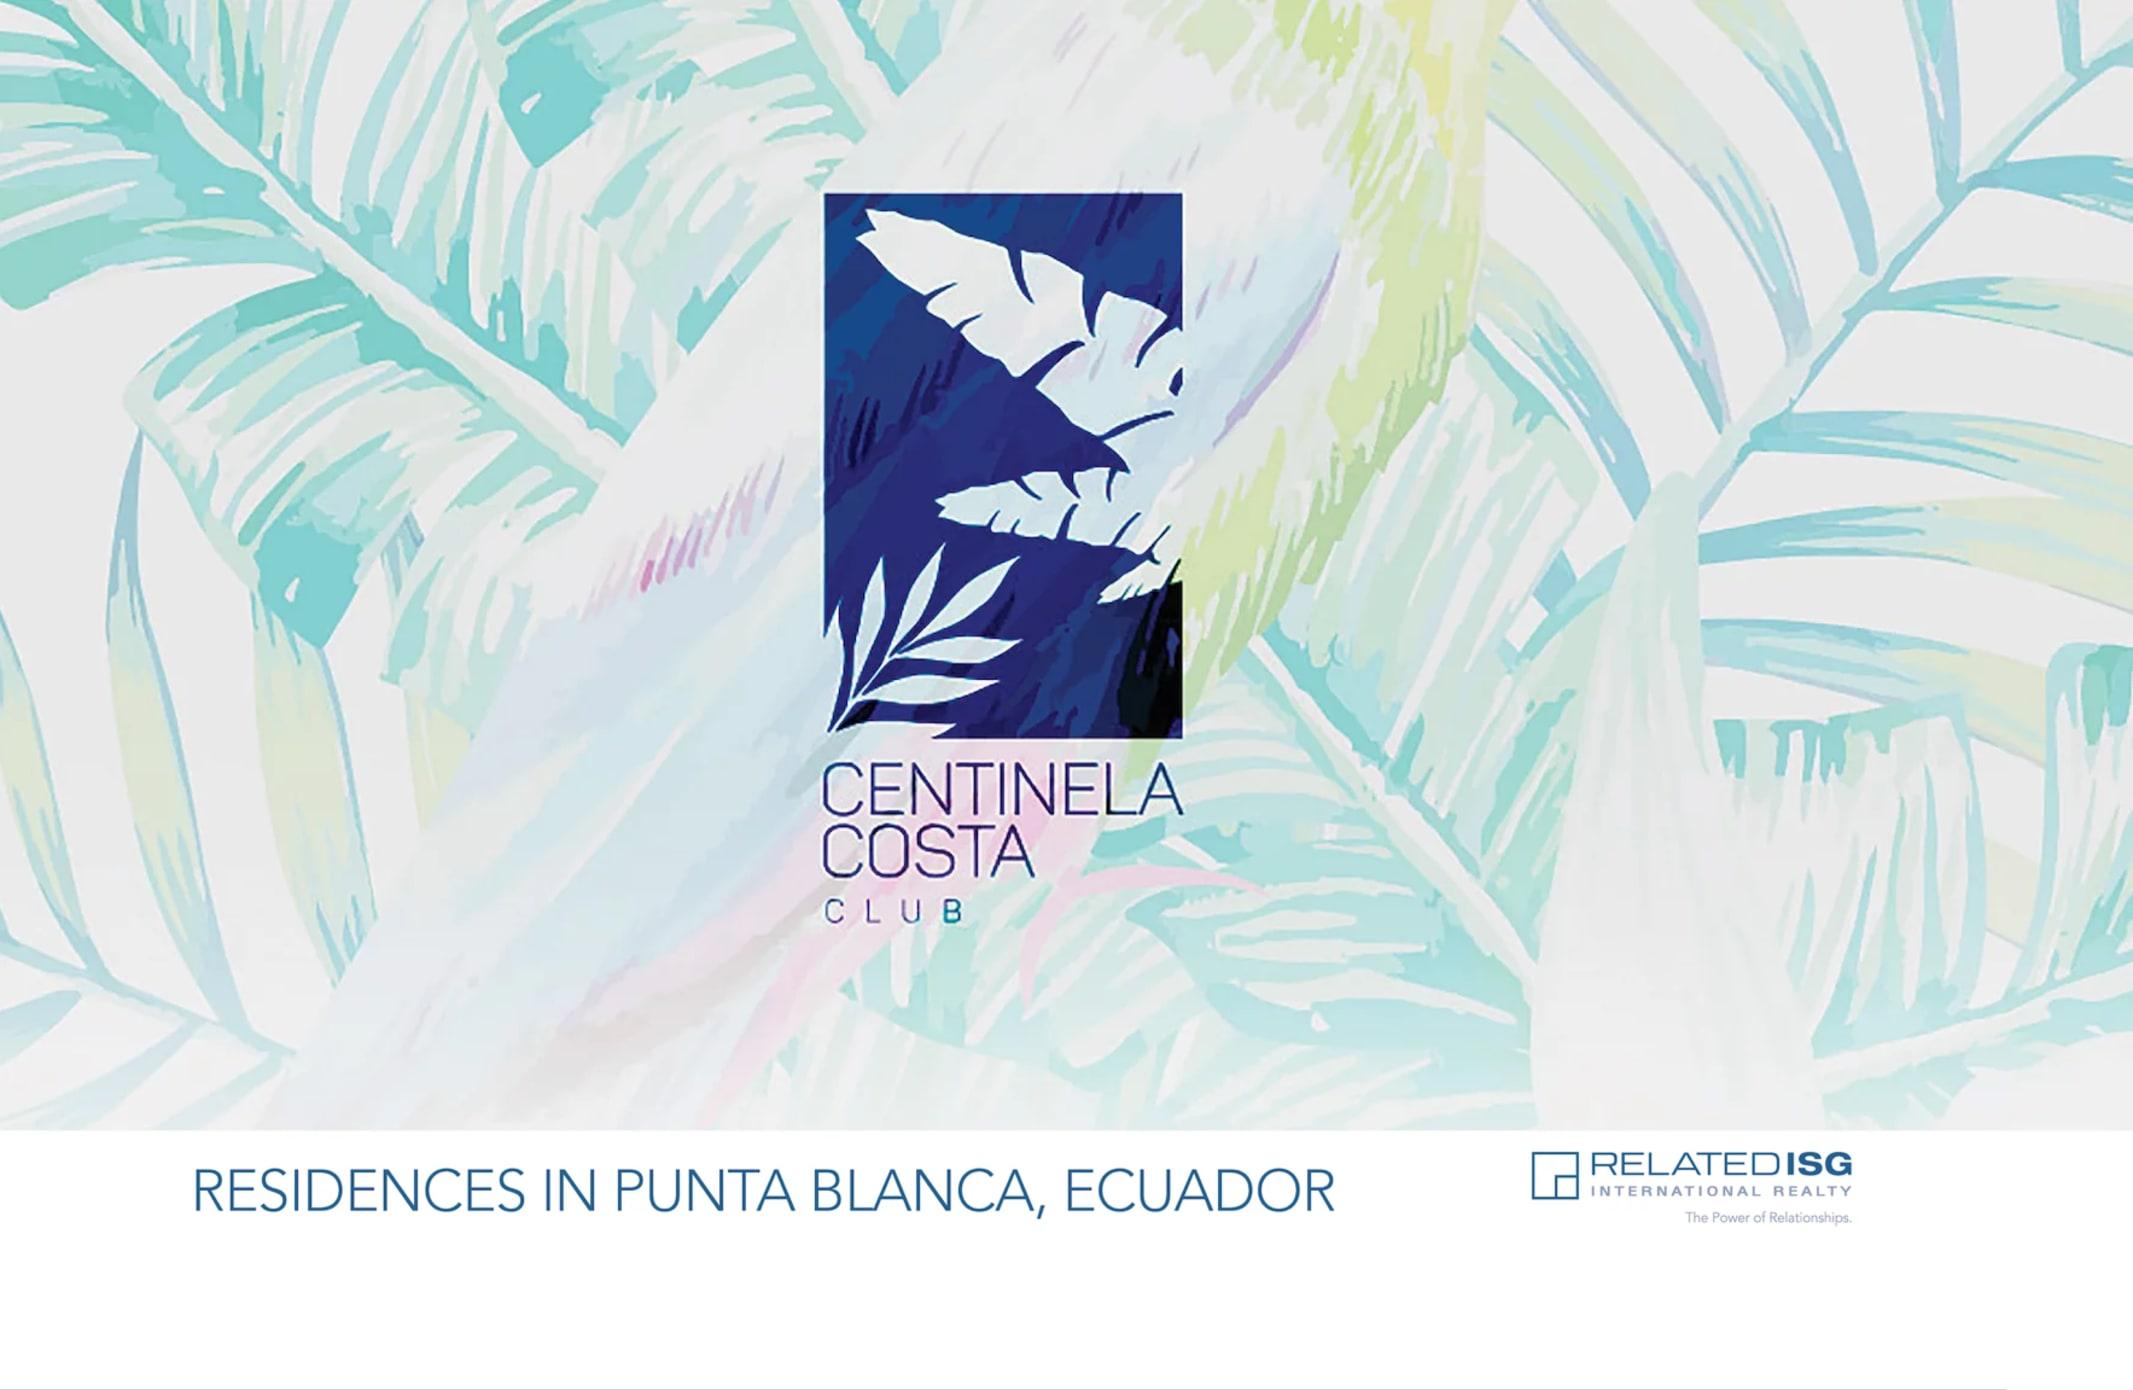 Costa Centinela